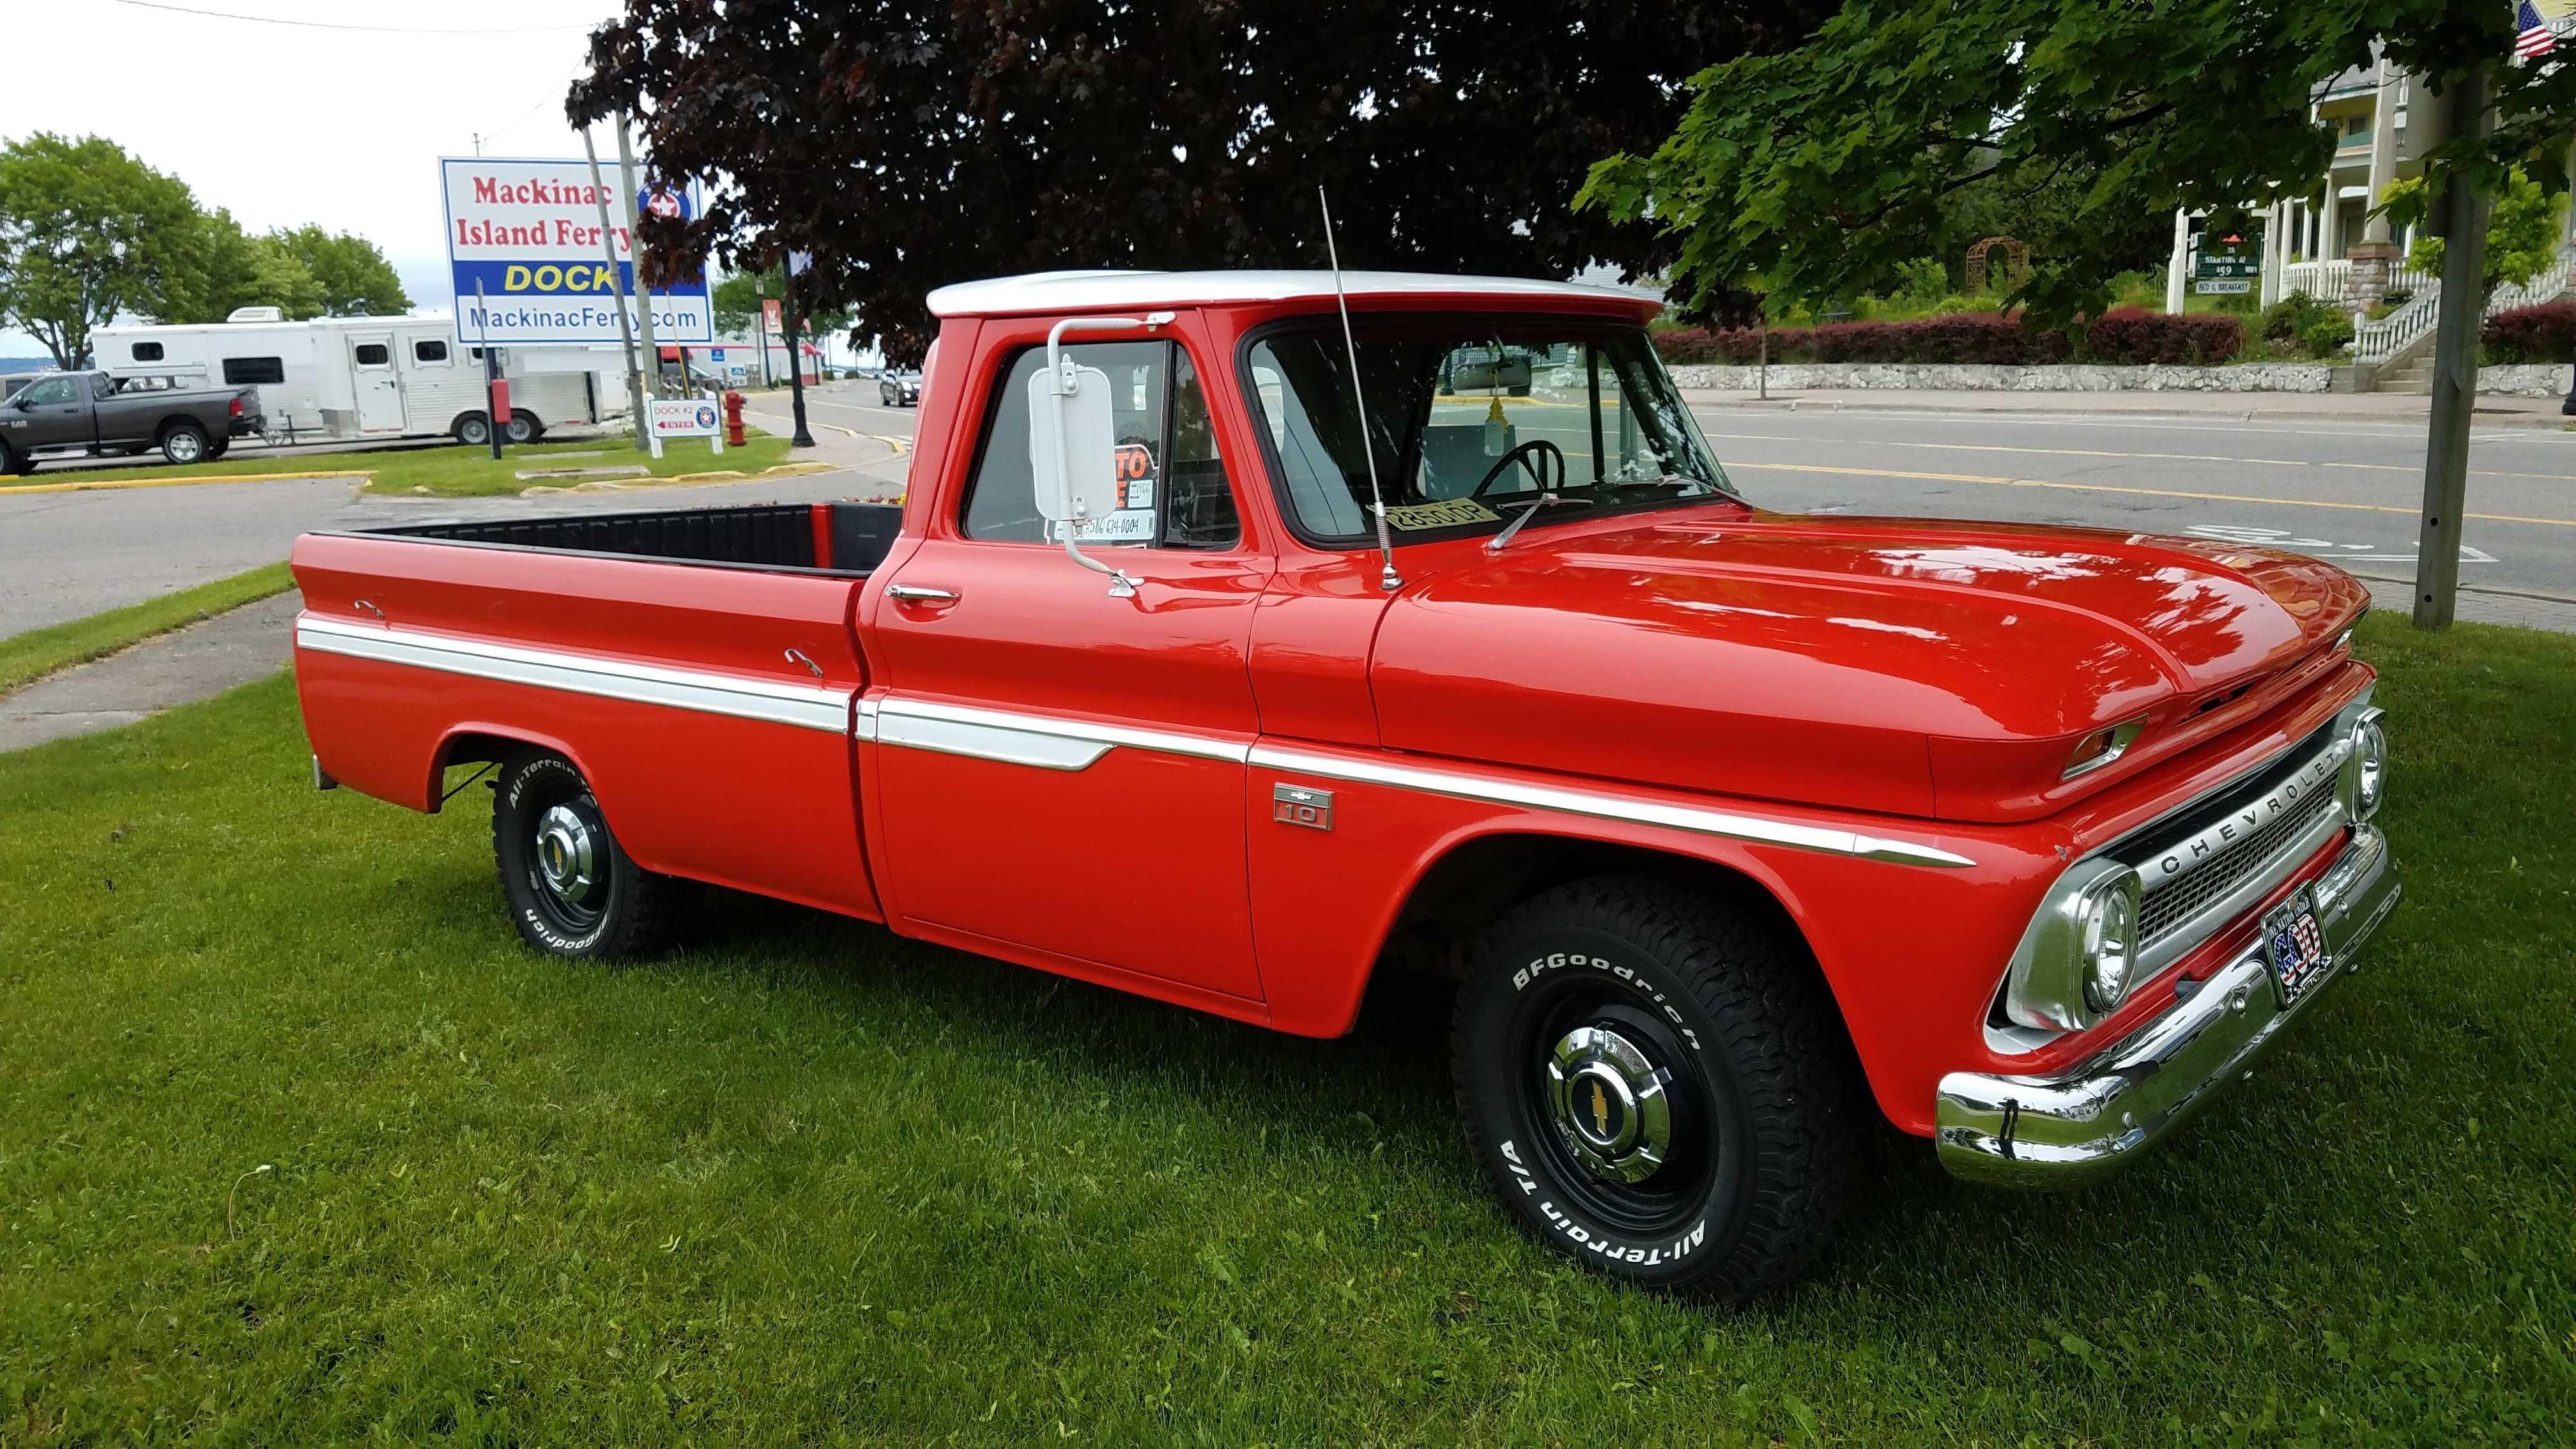 1966 Chevrolet C K Trucks For Sale In Sterling Heights Mi Pickup Truck